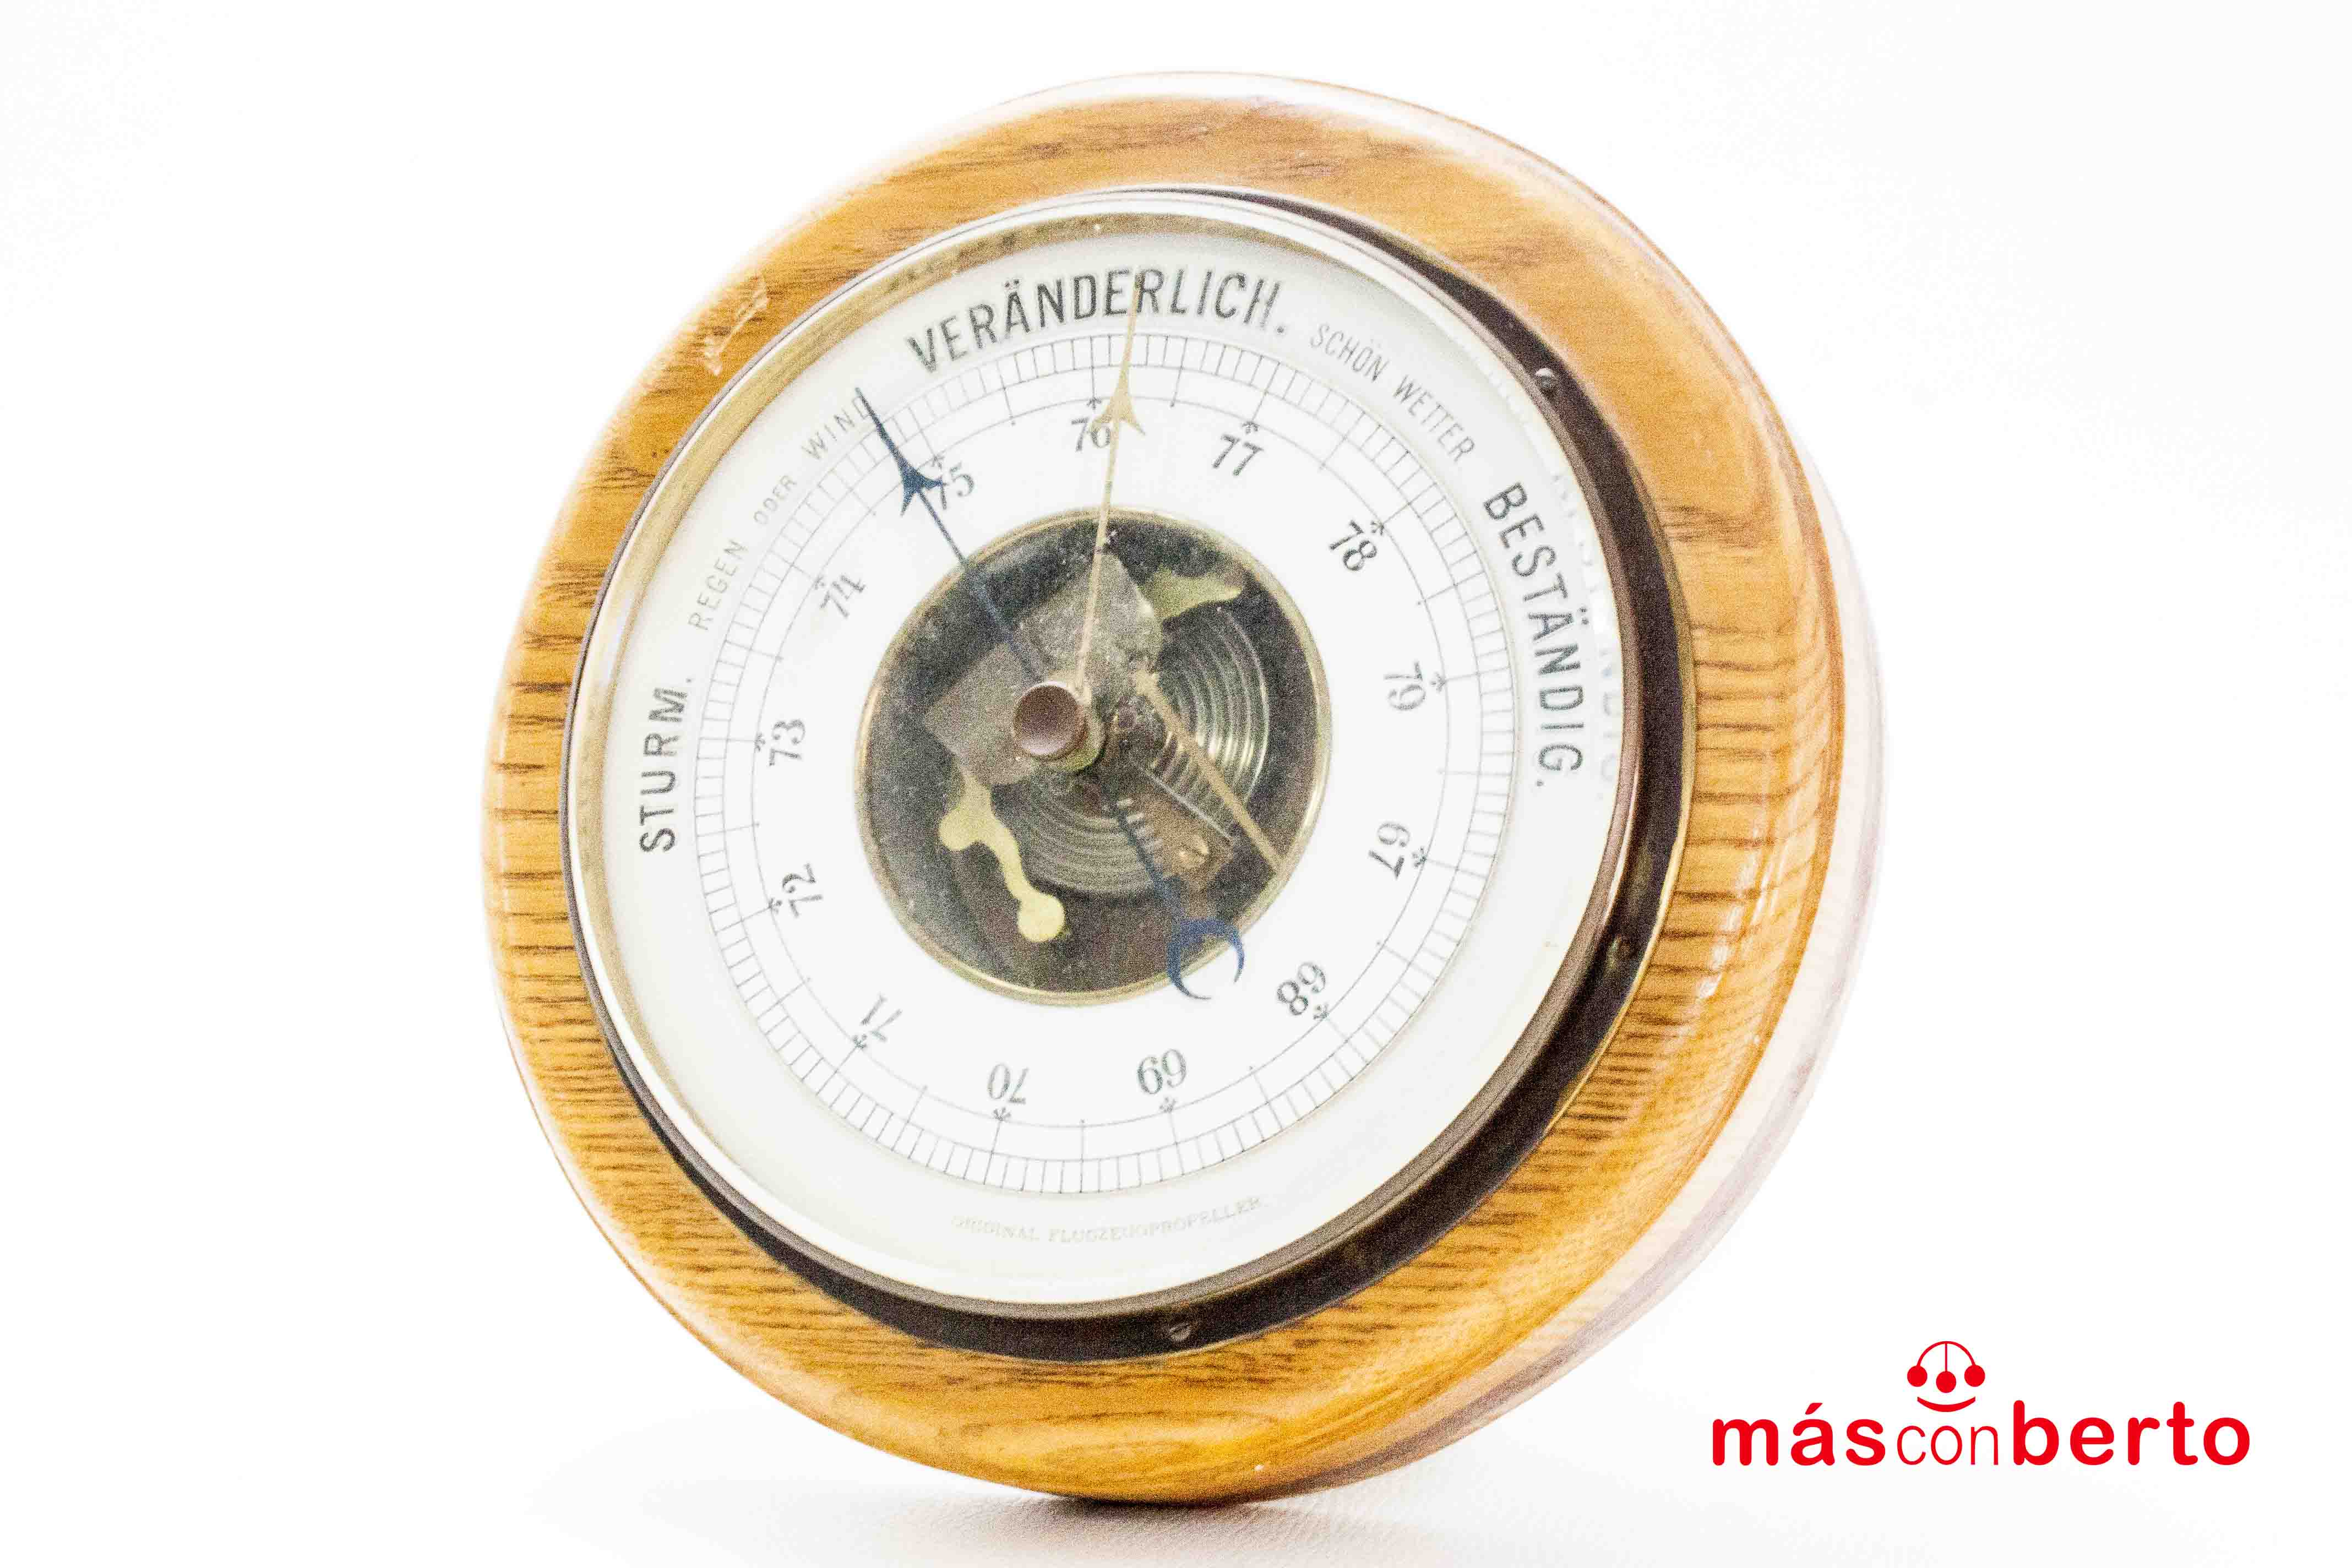 Barómetro Veranderlich Be...